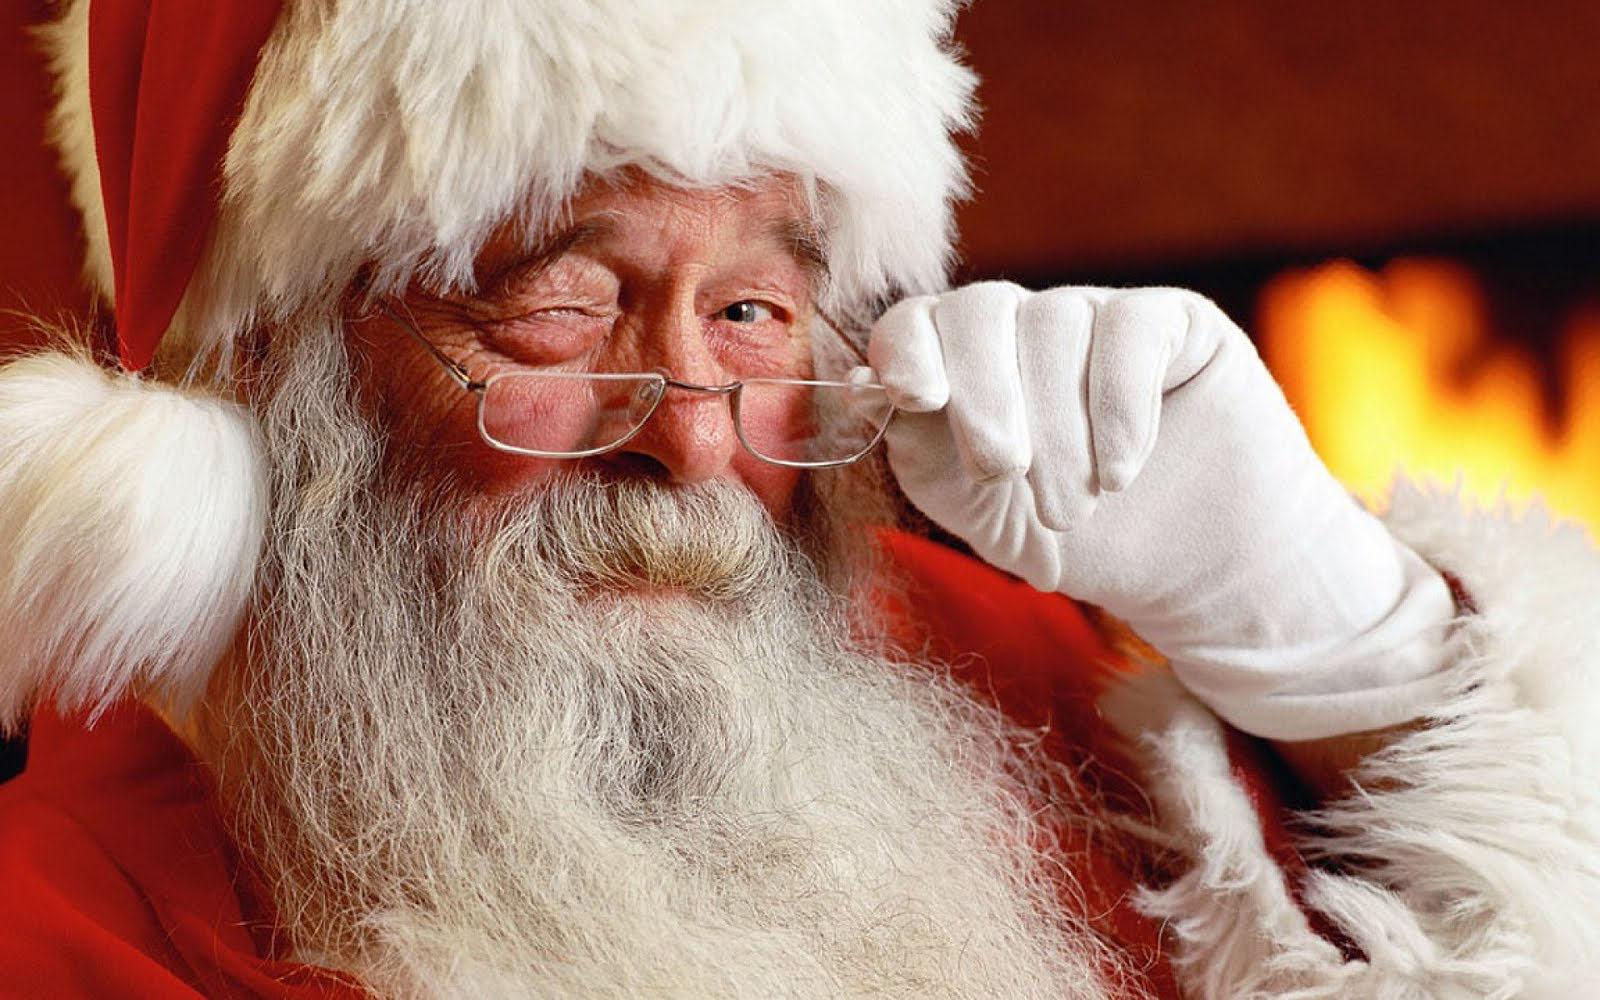 http://2.bp.blogspot.com/-V8vhtwuSw0c/Tq_ShV8HbhI/AAAAAAAAP0o/KPGG4BoOEoM/s1600/Mooie-kerstman-achtergronden-leuke-kerstman-wallpapers-afbeelding-plaatje-foto-1.jpg